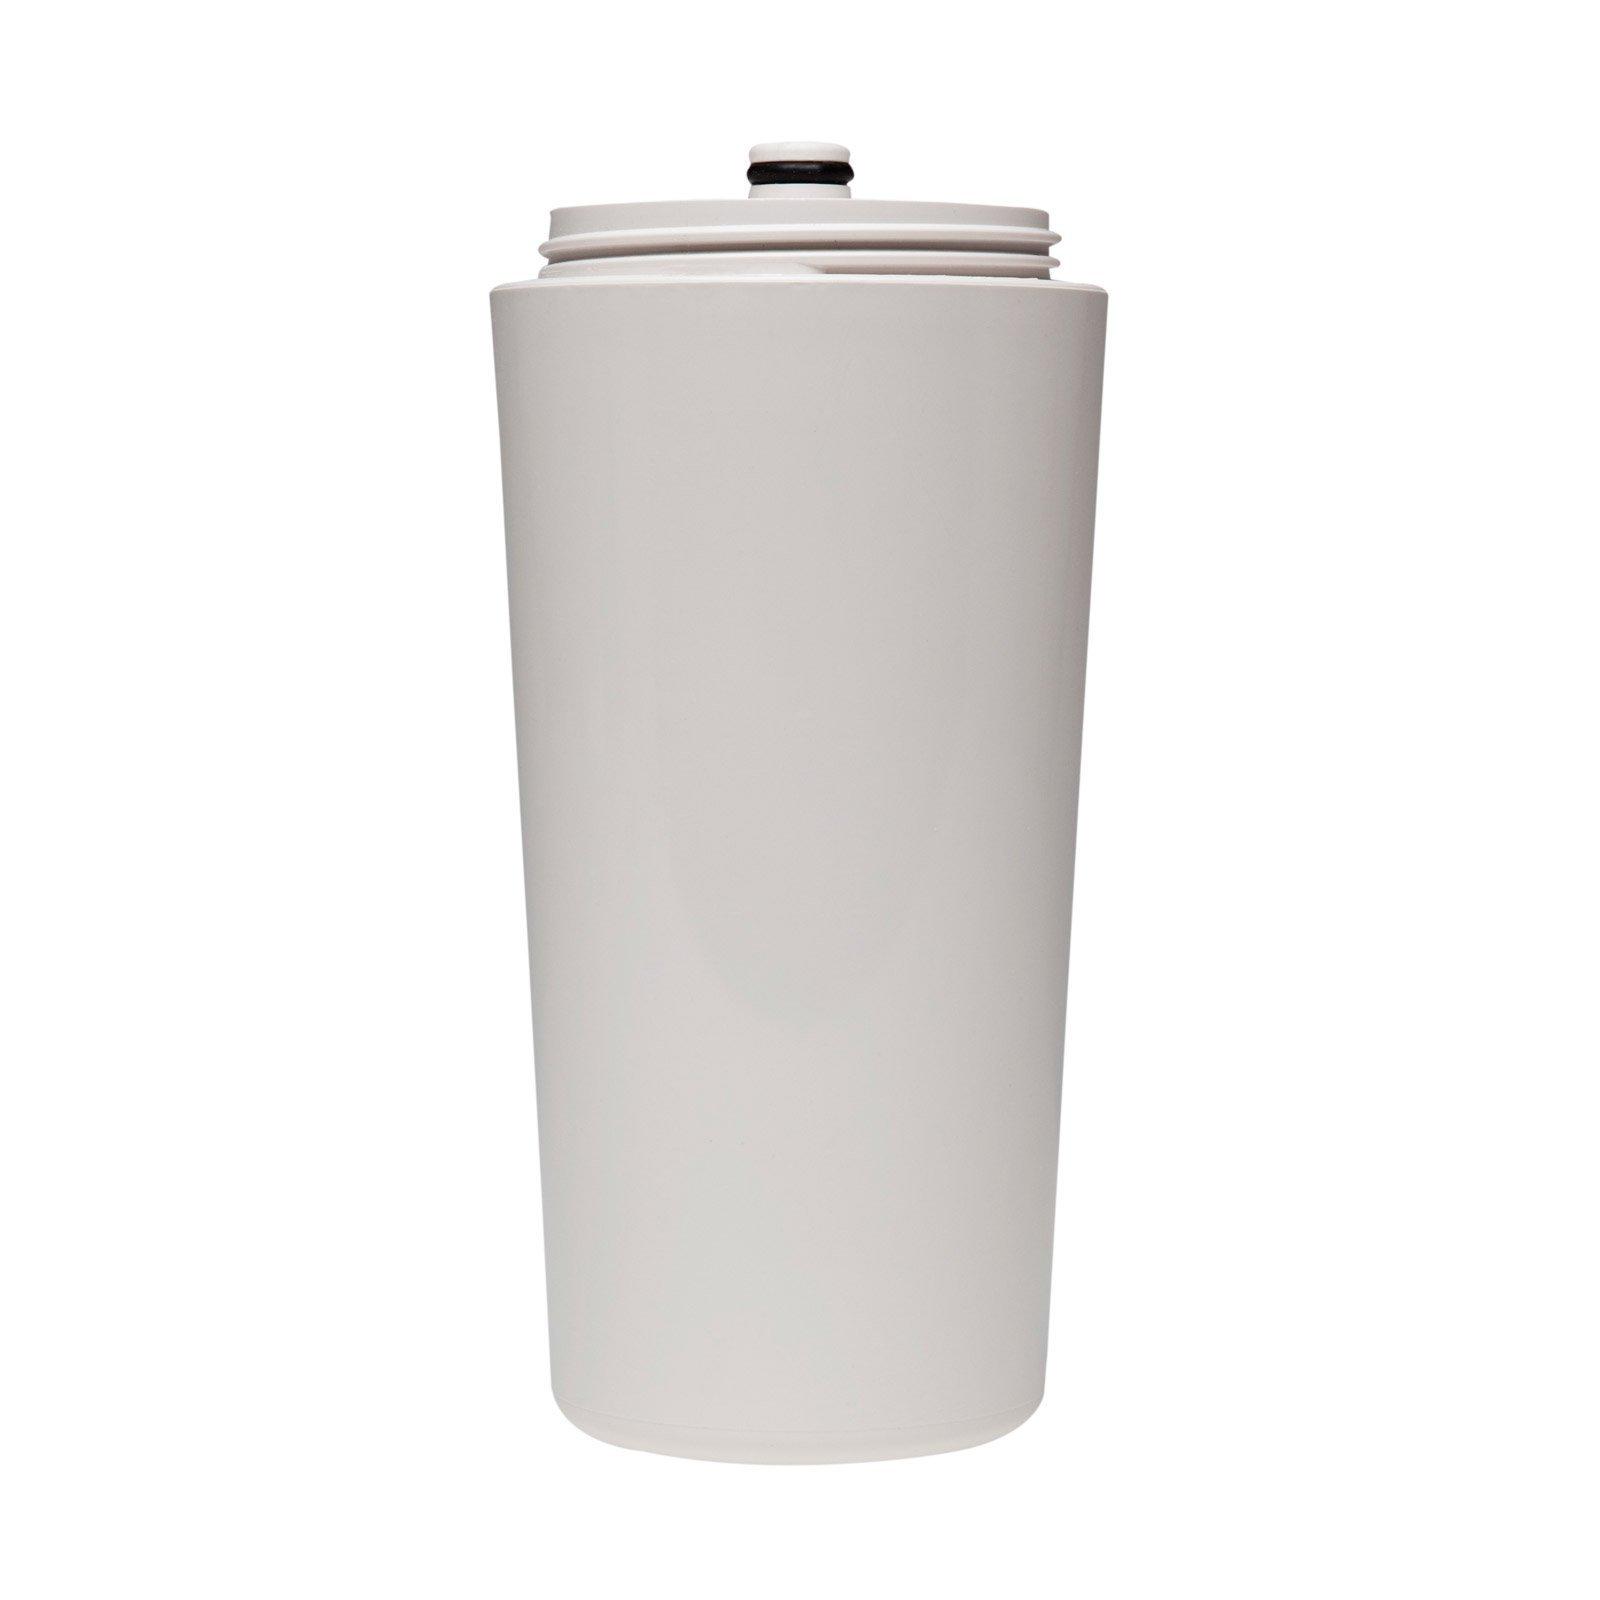 Image of Aquasana Shower Replacement Filter